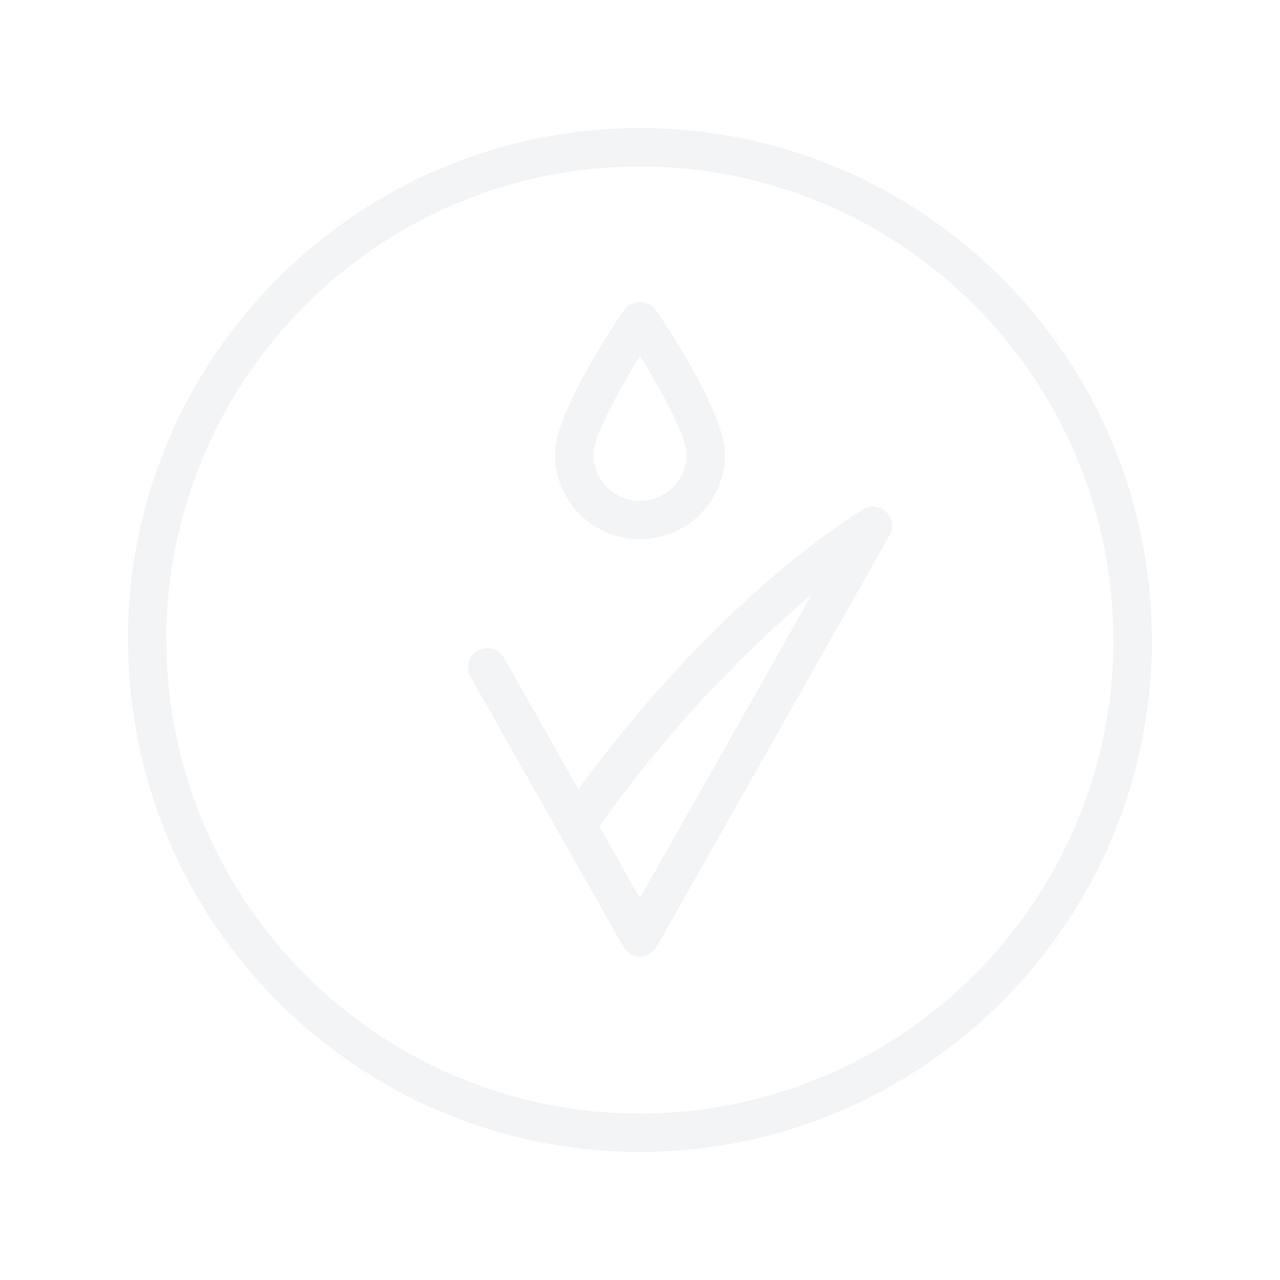 TAHE Urban Blumin Permanent Color No.10 Lightest Blonde 60ml